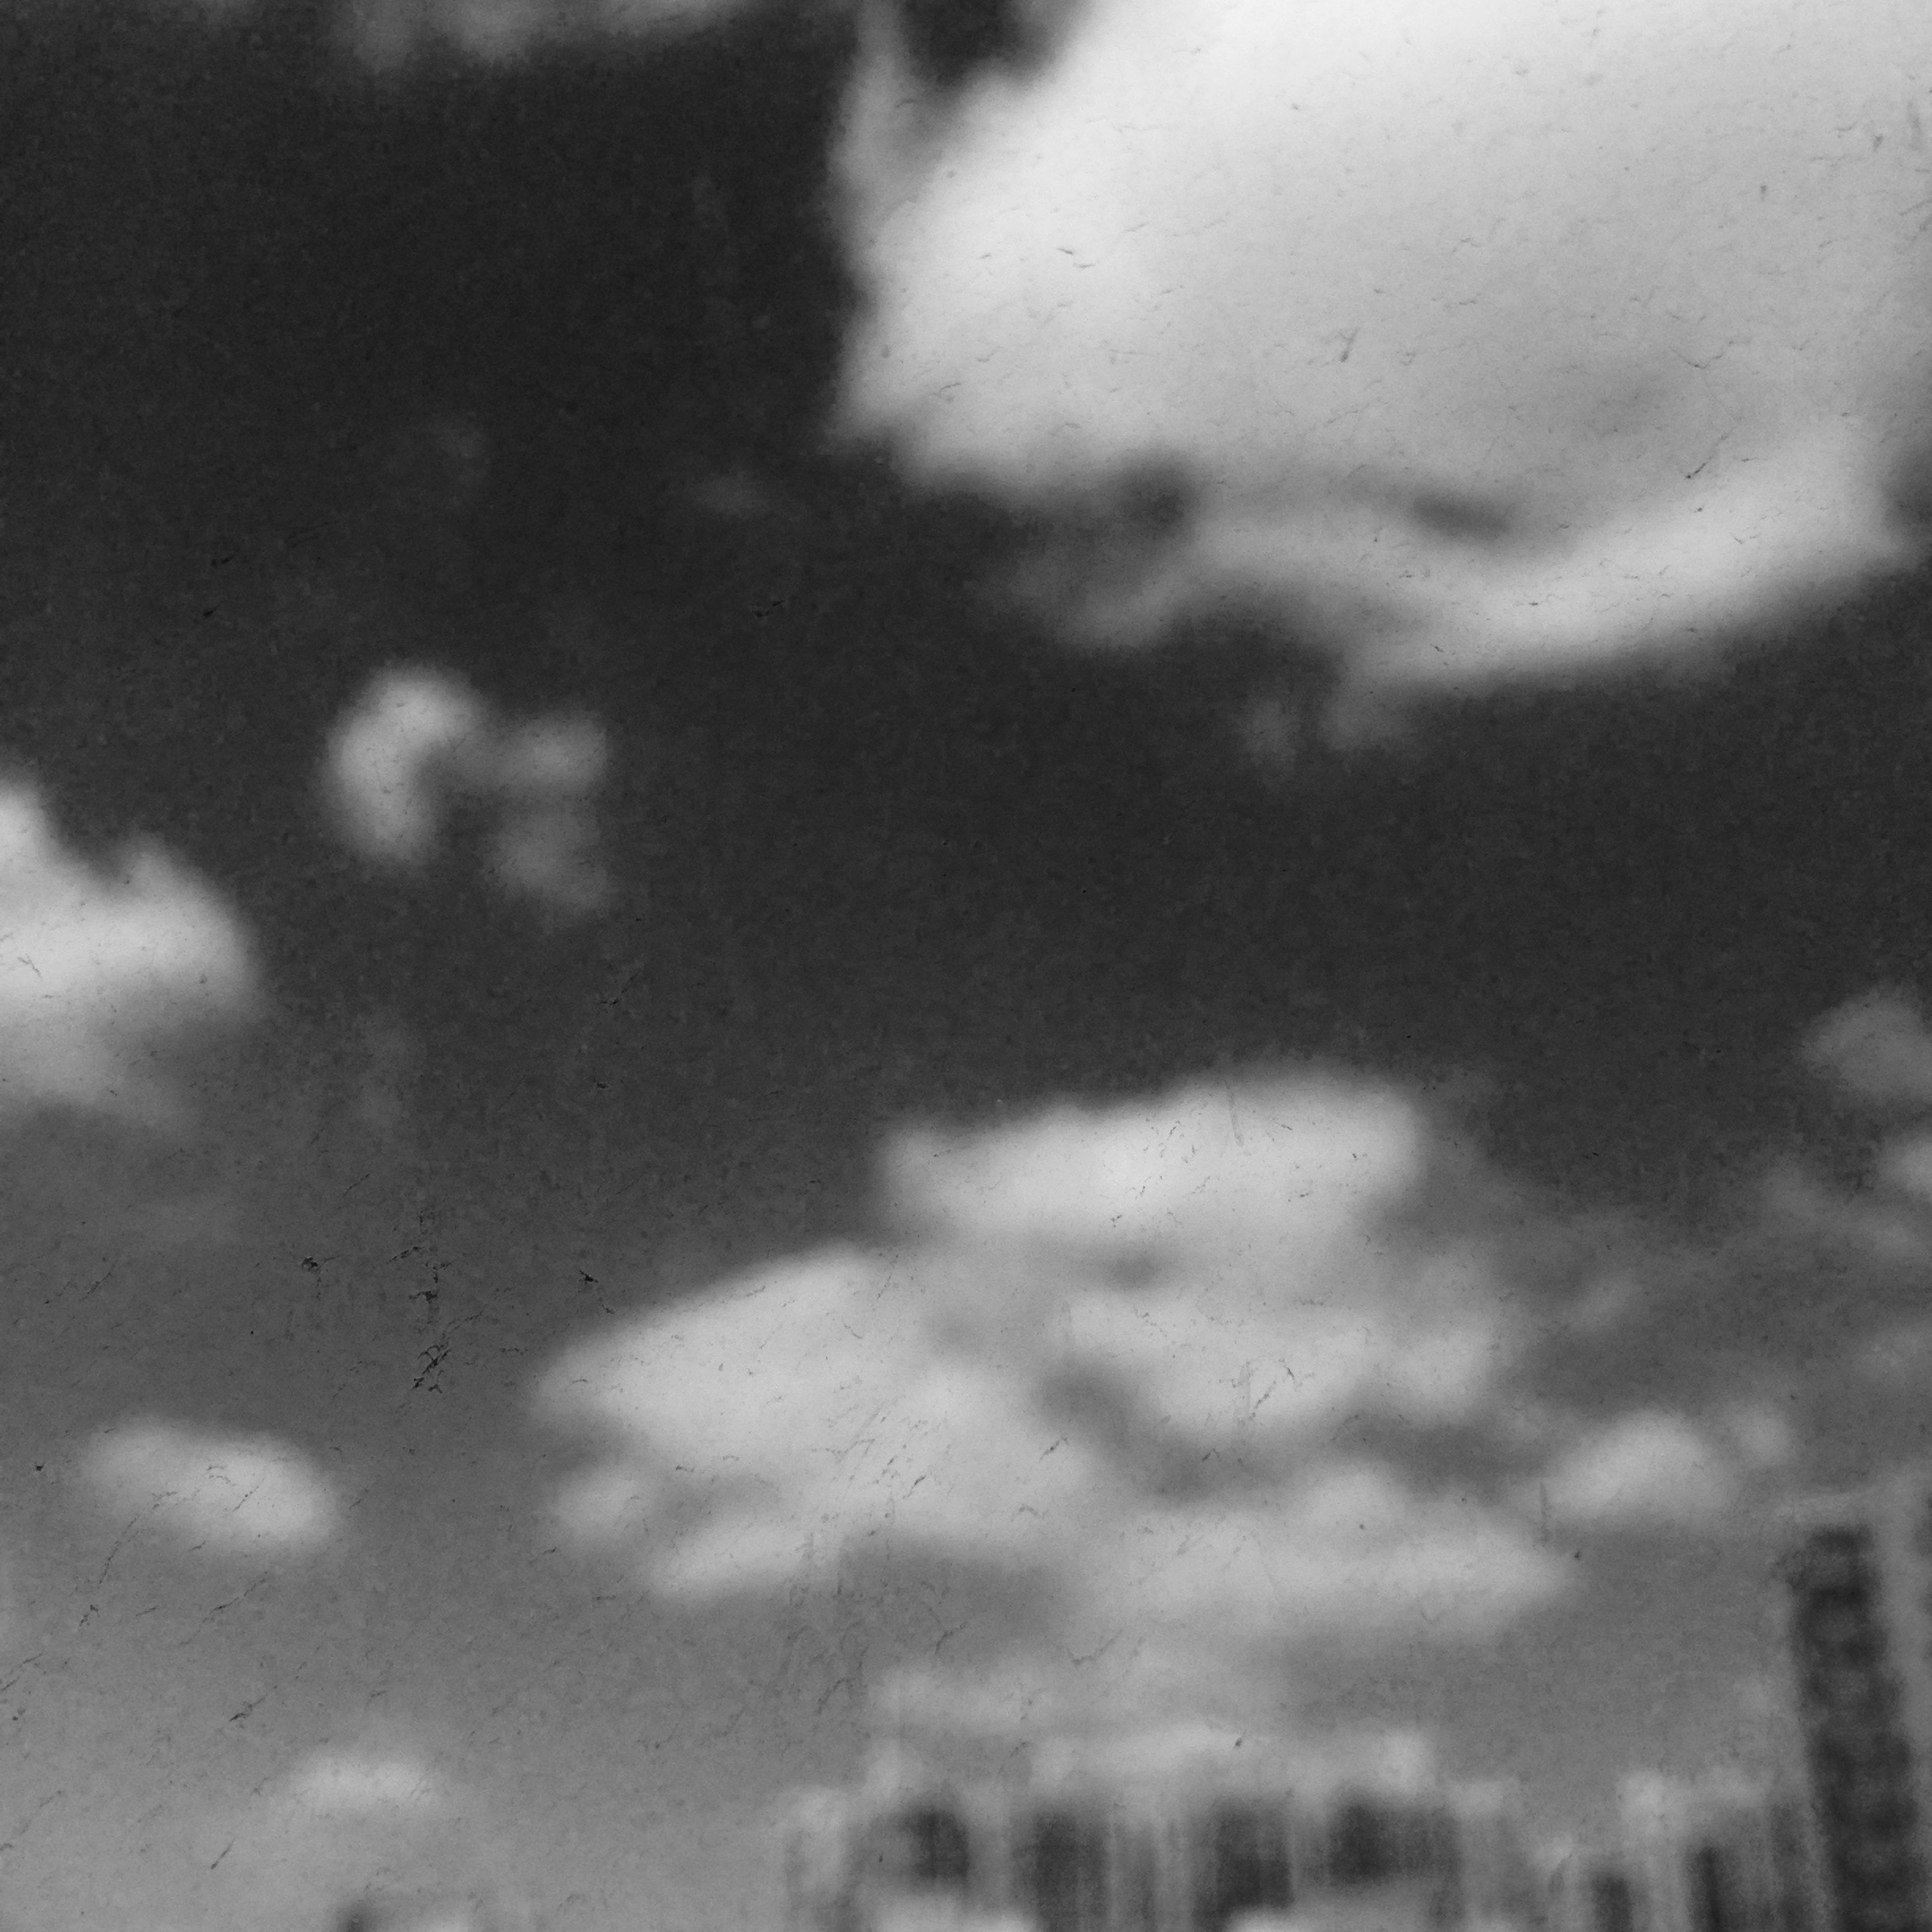 sky, no people, cloud - sky, nature, outdoors, day, close-up